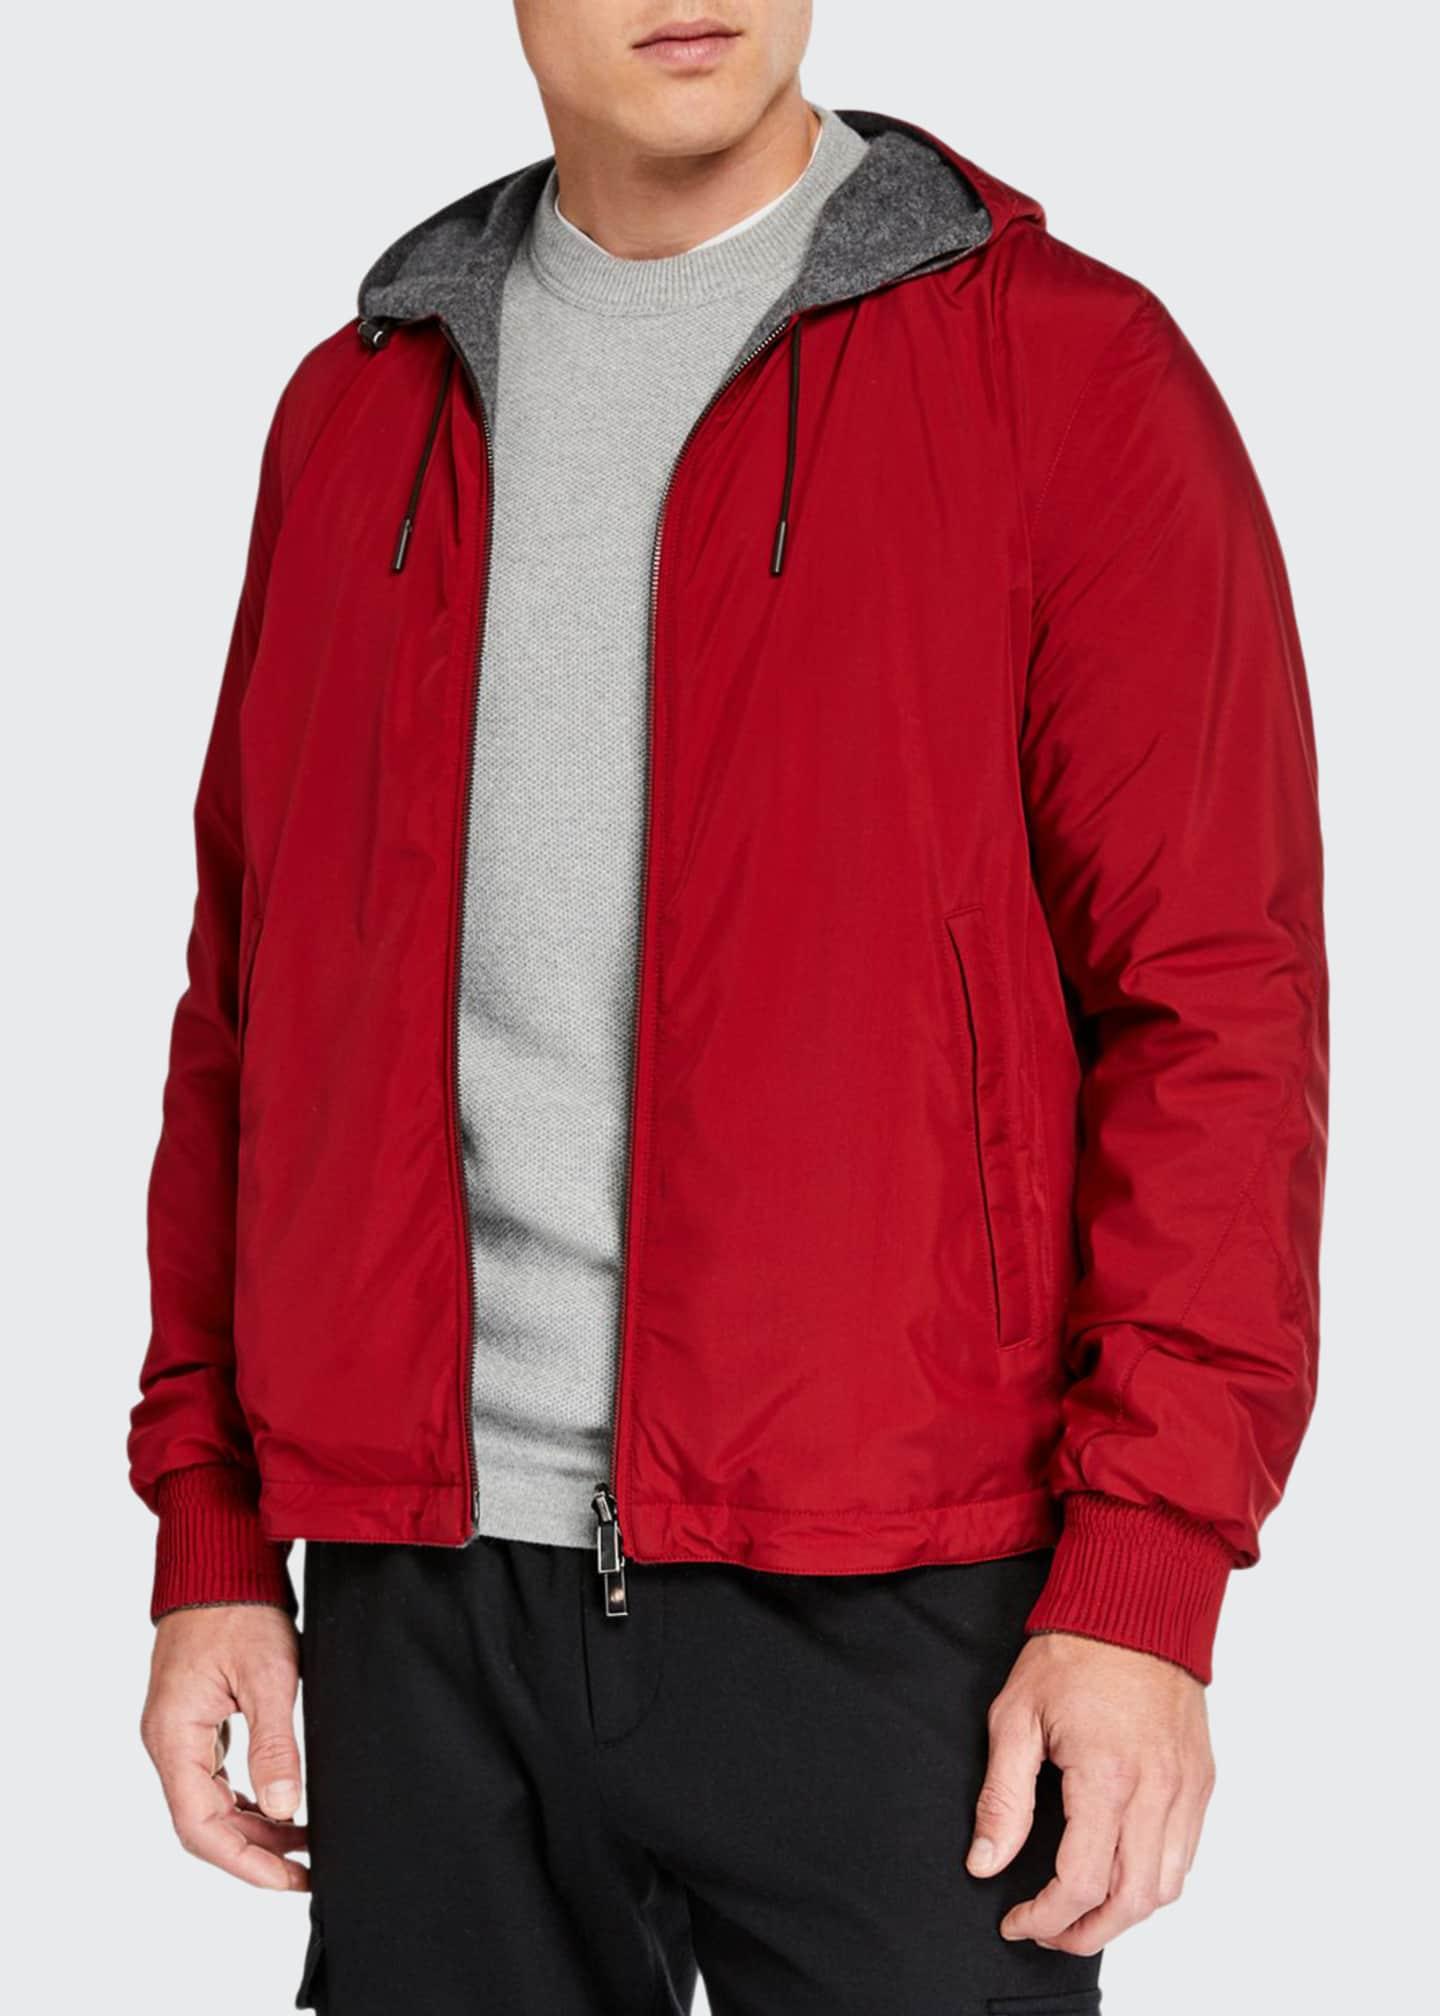 Ermenegildo Zegna Men's Breeze Breaker Wind-Resistant Jacket